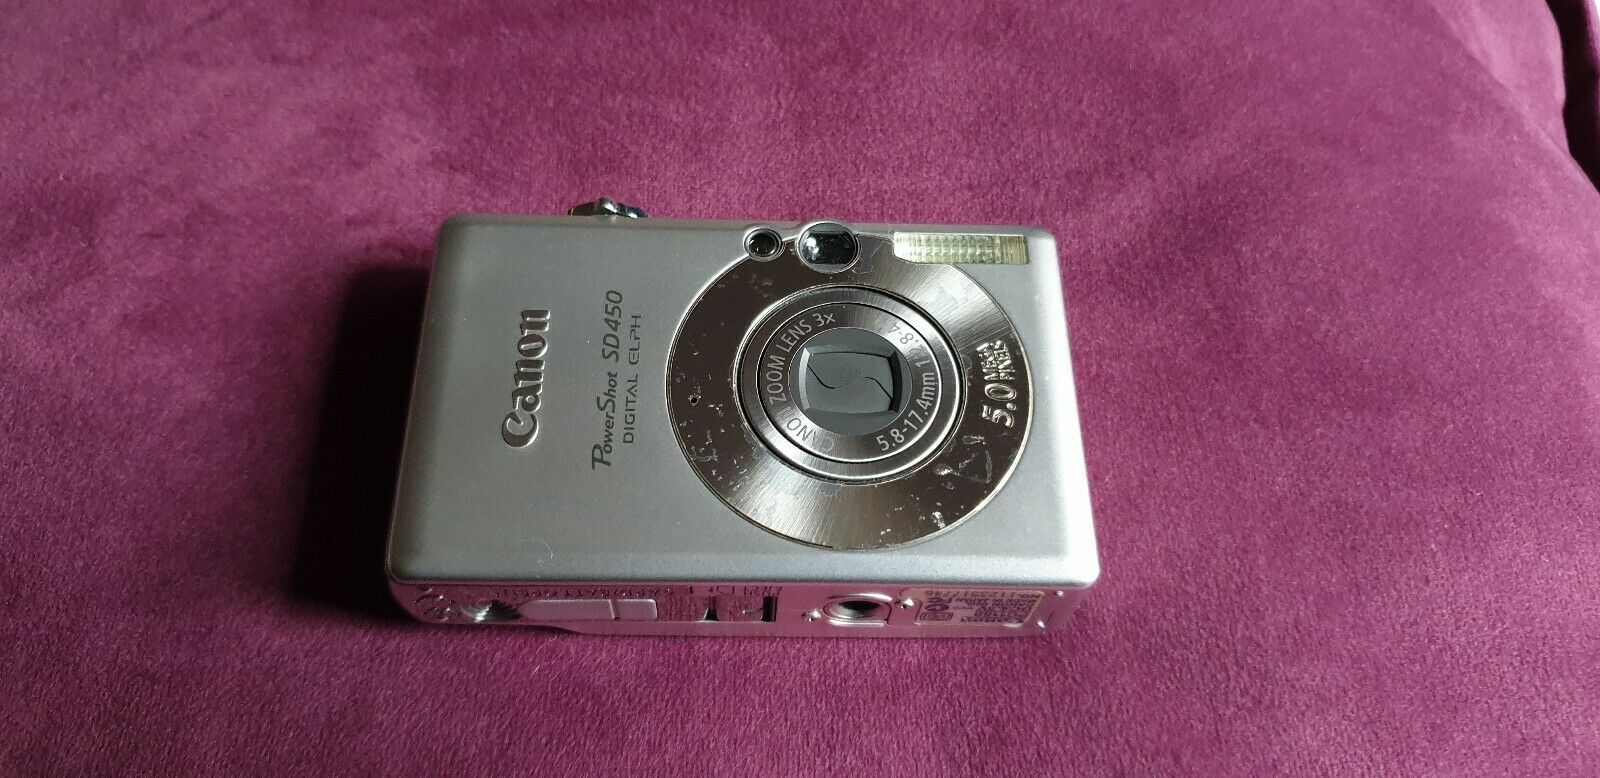 Canon Powershot SD450 - Ixus 55 UK- For parts